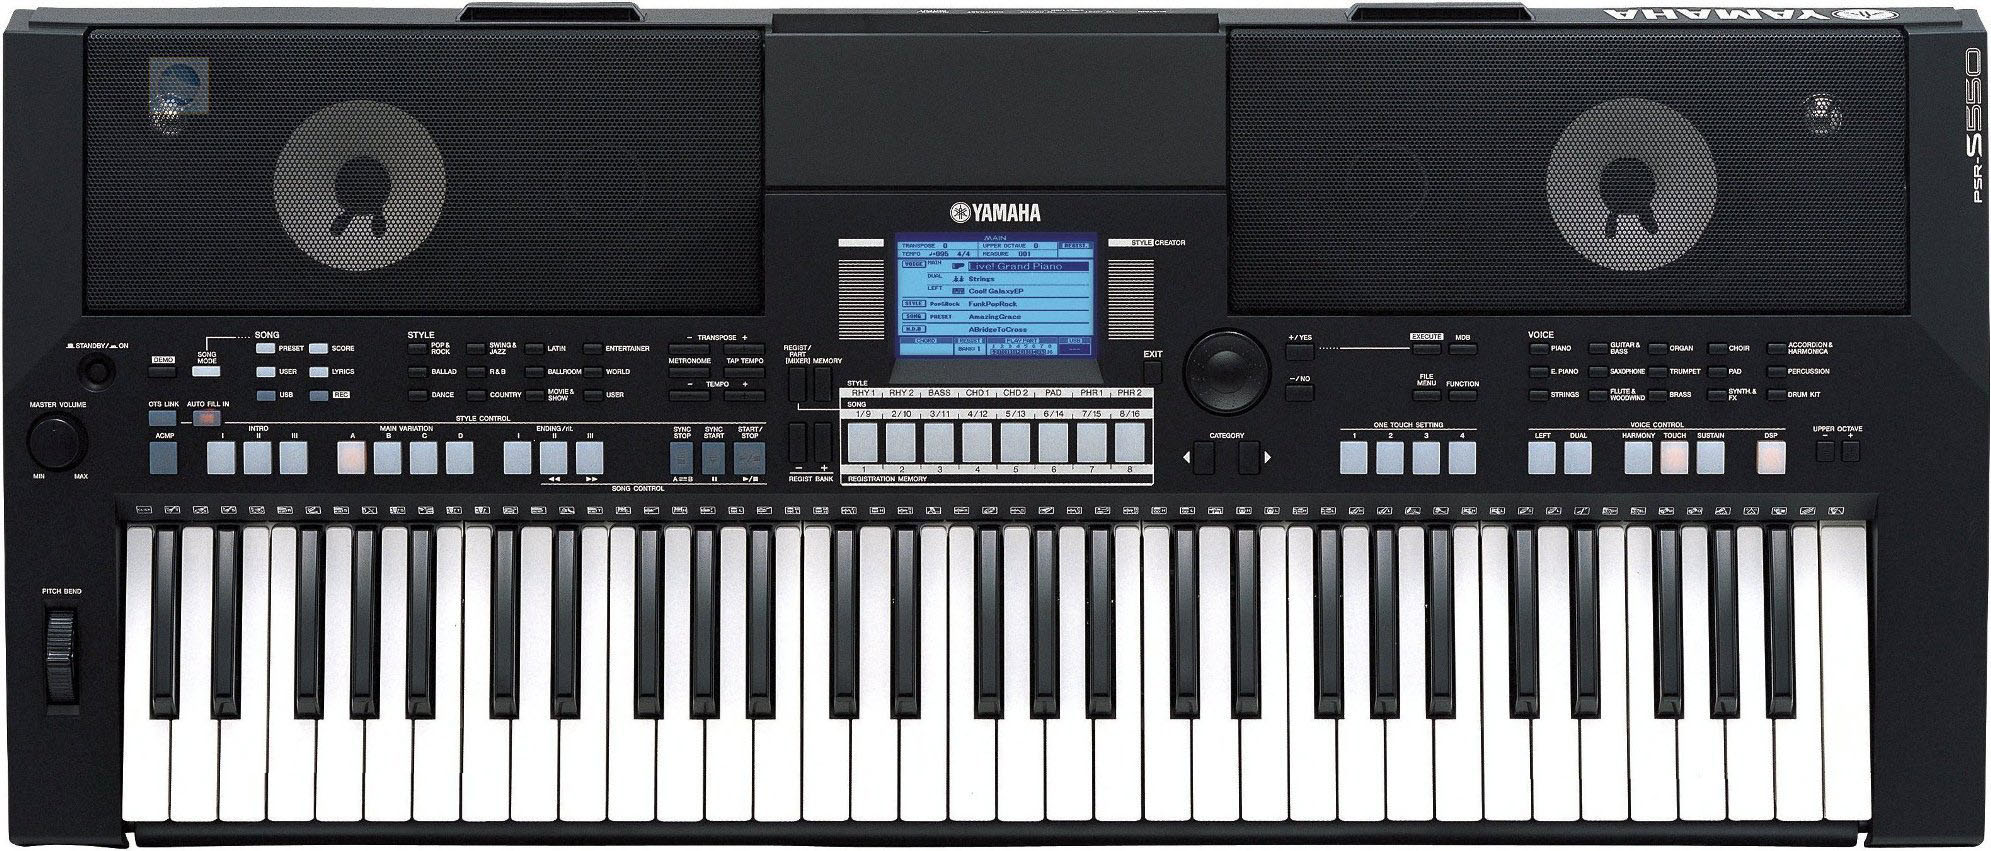 YAMAHA PSR S550 USB-MIDI WINDOWS 7 DRIVER DOWNLOAD